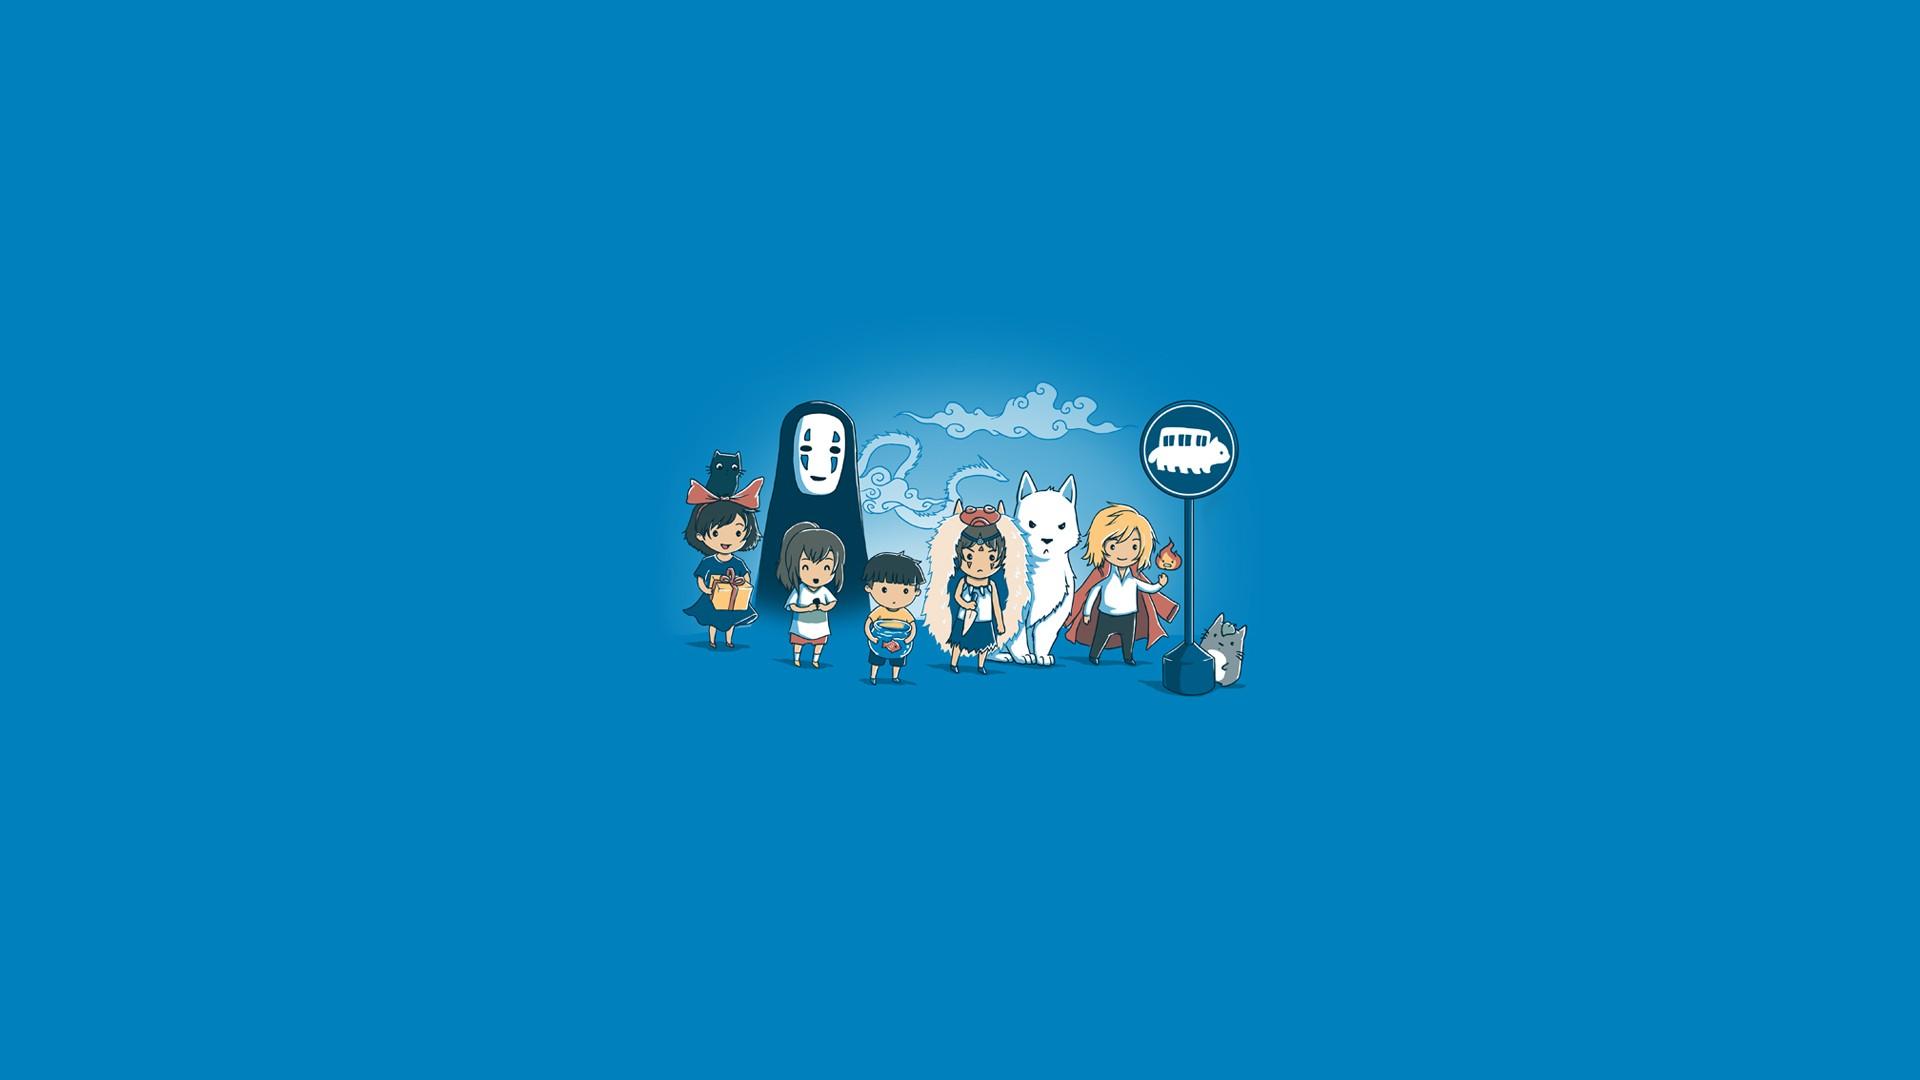 Wallpaper Ghibli My Neighbor Totoro Anime Iphone 6 Studio